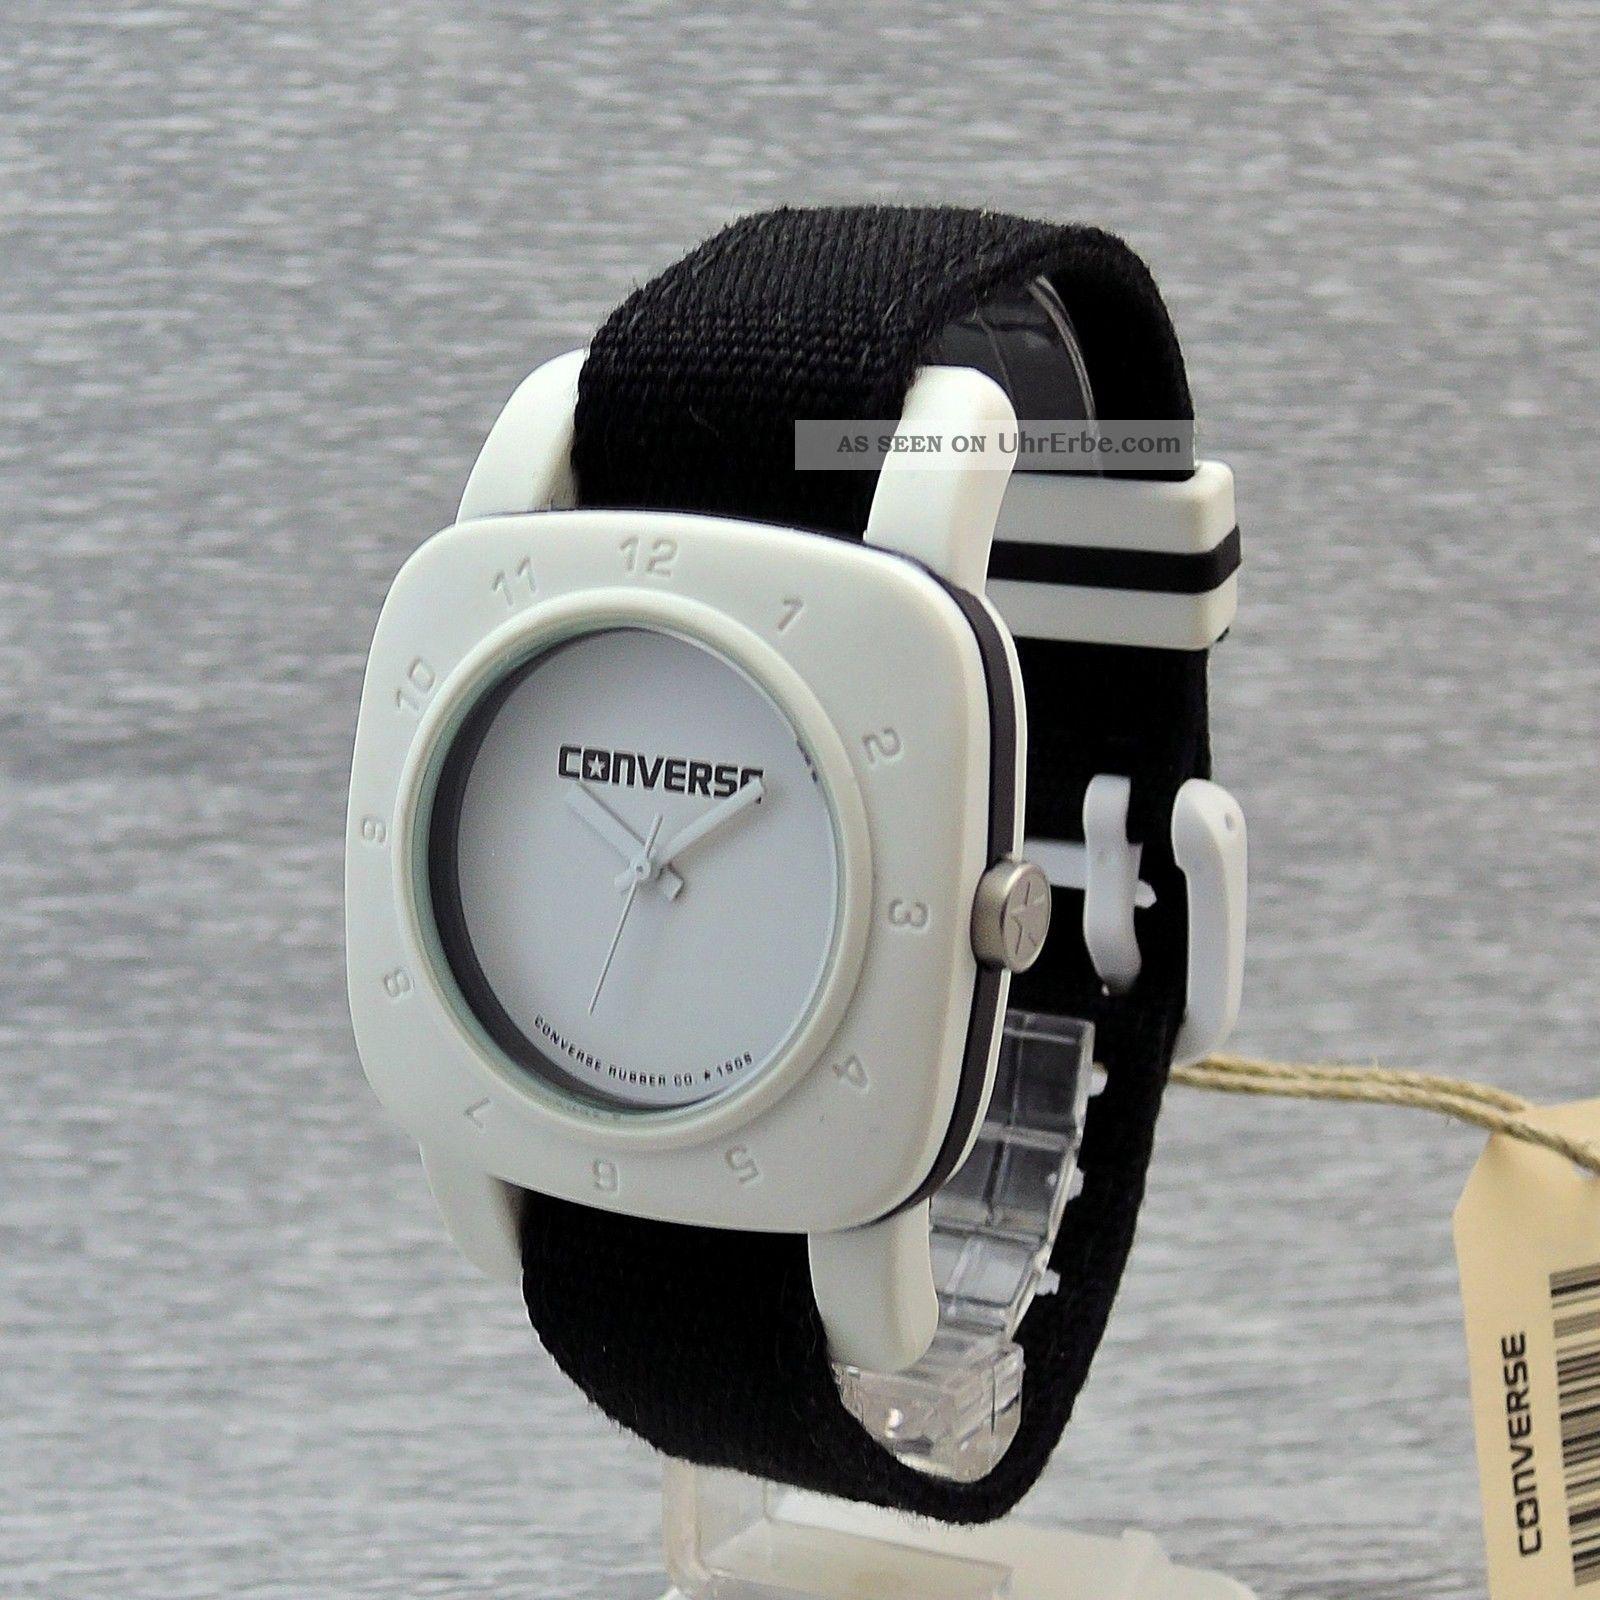 Converse 001 Quarz Damenarmbanduhr Vr021 Uhr Damenuhr 1908 Quarzuhr 80OPwkn